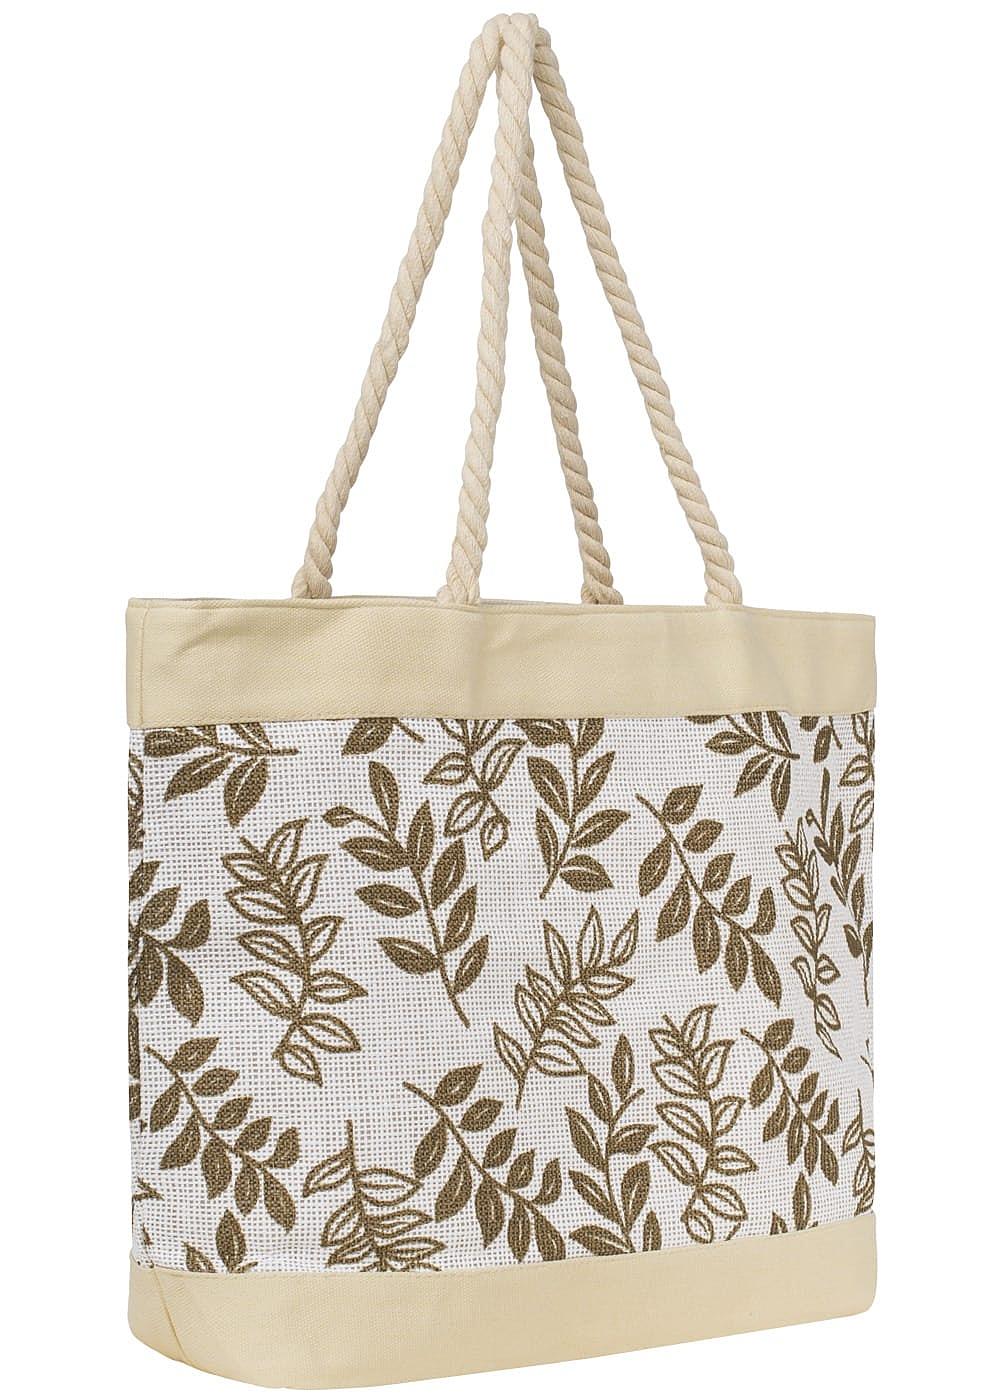 seventyseven lifestyle damen strandtasche beige 77onlineshop. Black Bedroom Furniture Sets. Home Design Ideas